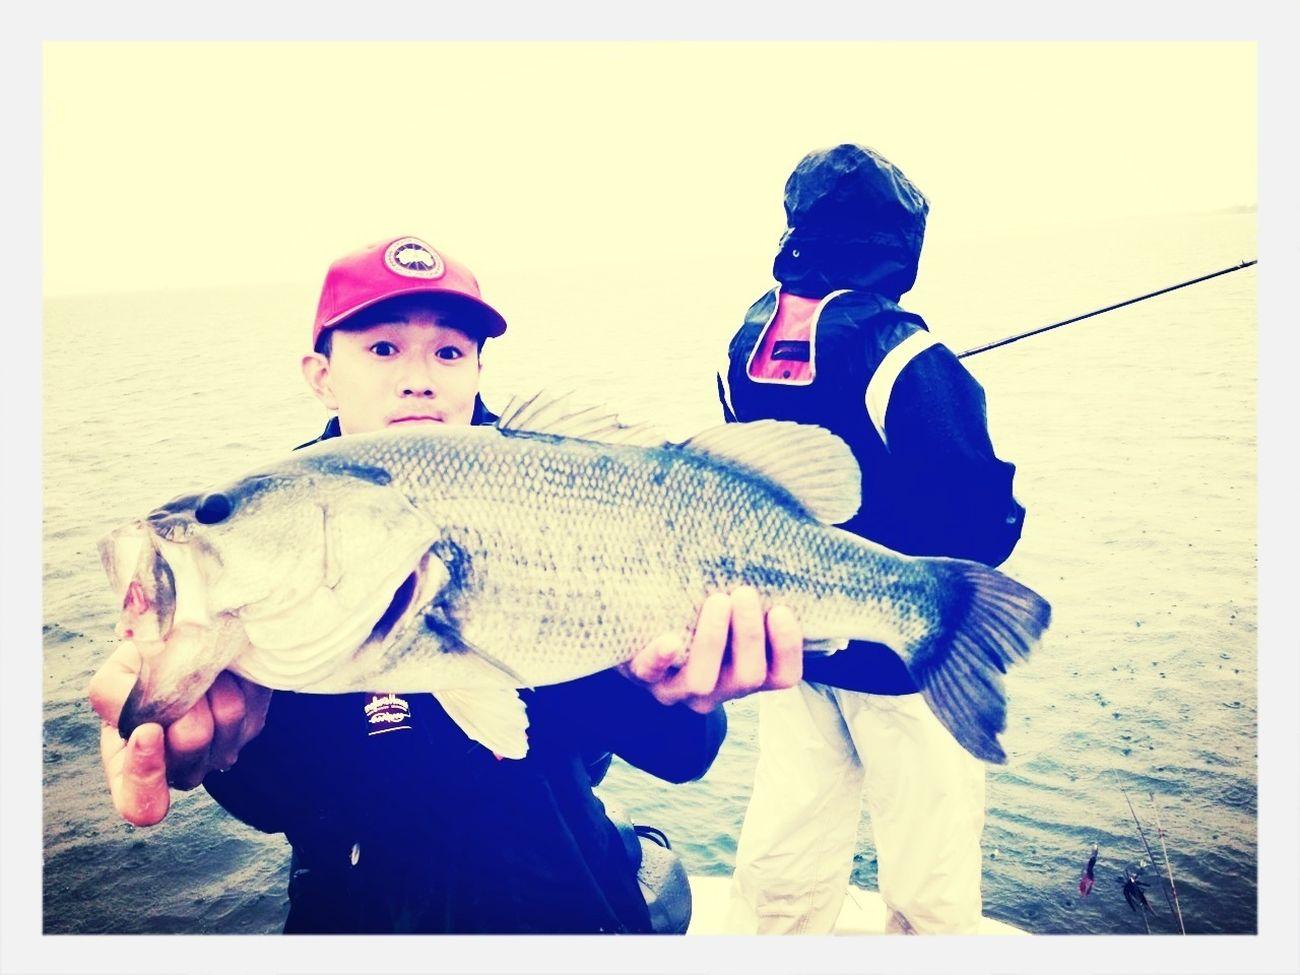 Bass Fishing 10 Minutes Turitech